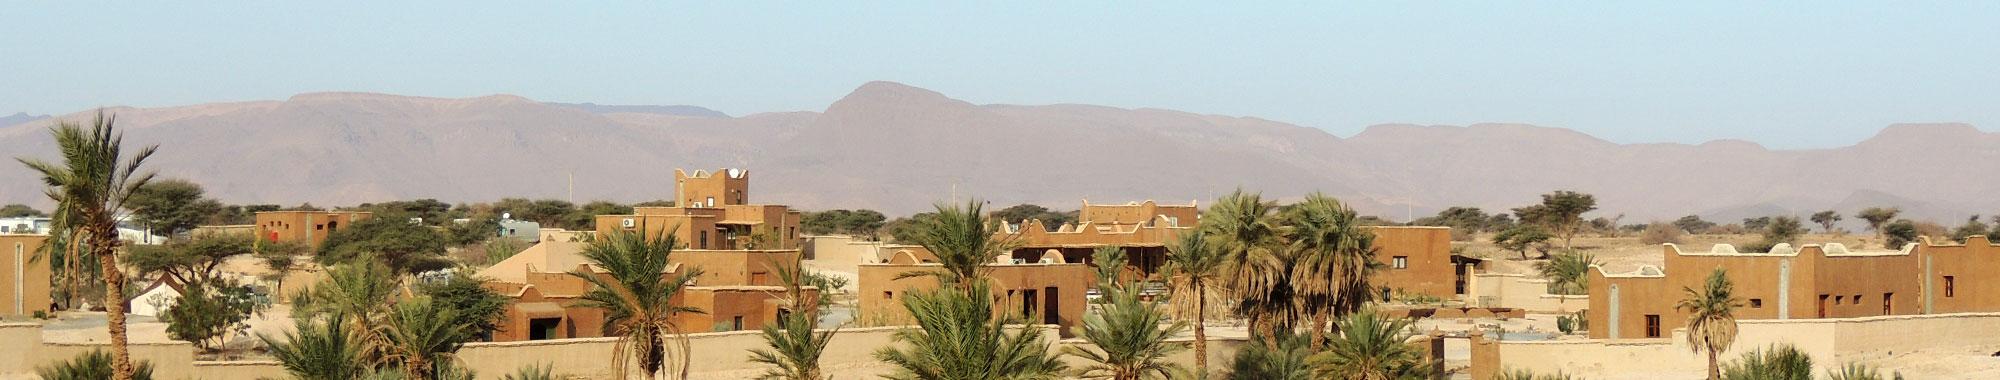 Borj Biramane - Auberge Sud Maroc